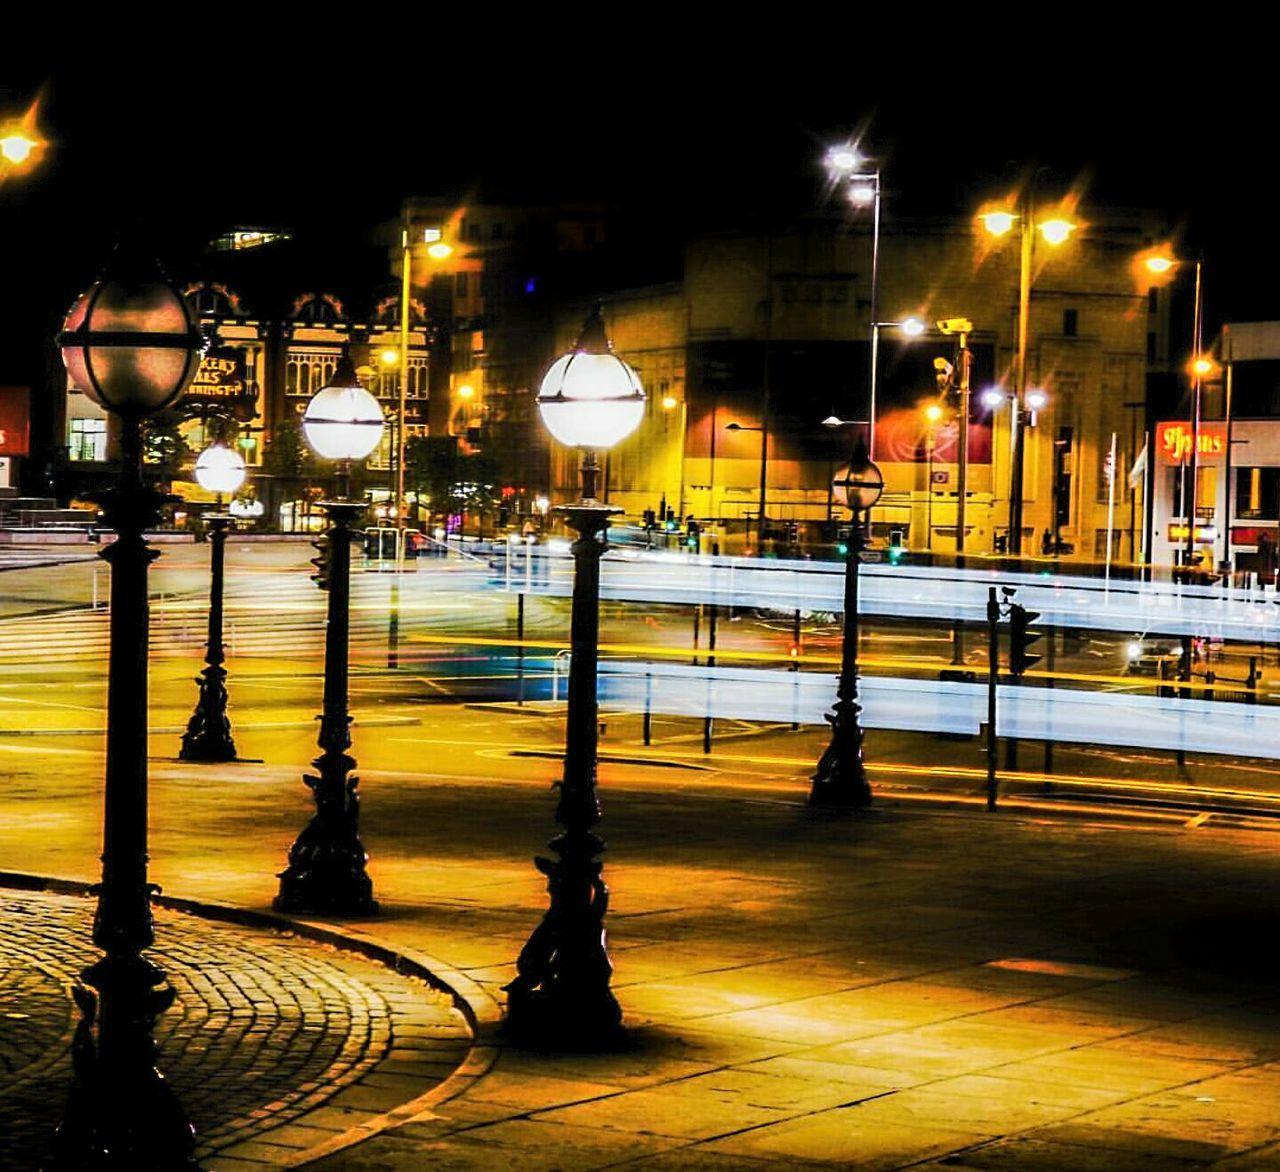 illuminated, night, street light, no people, outdoors